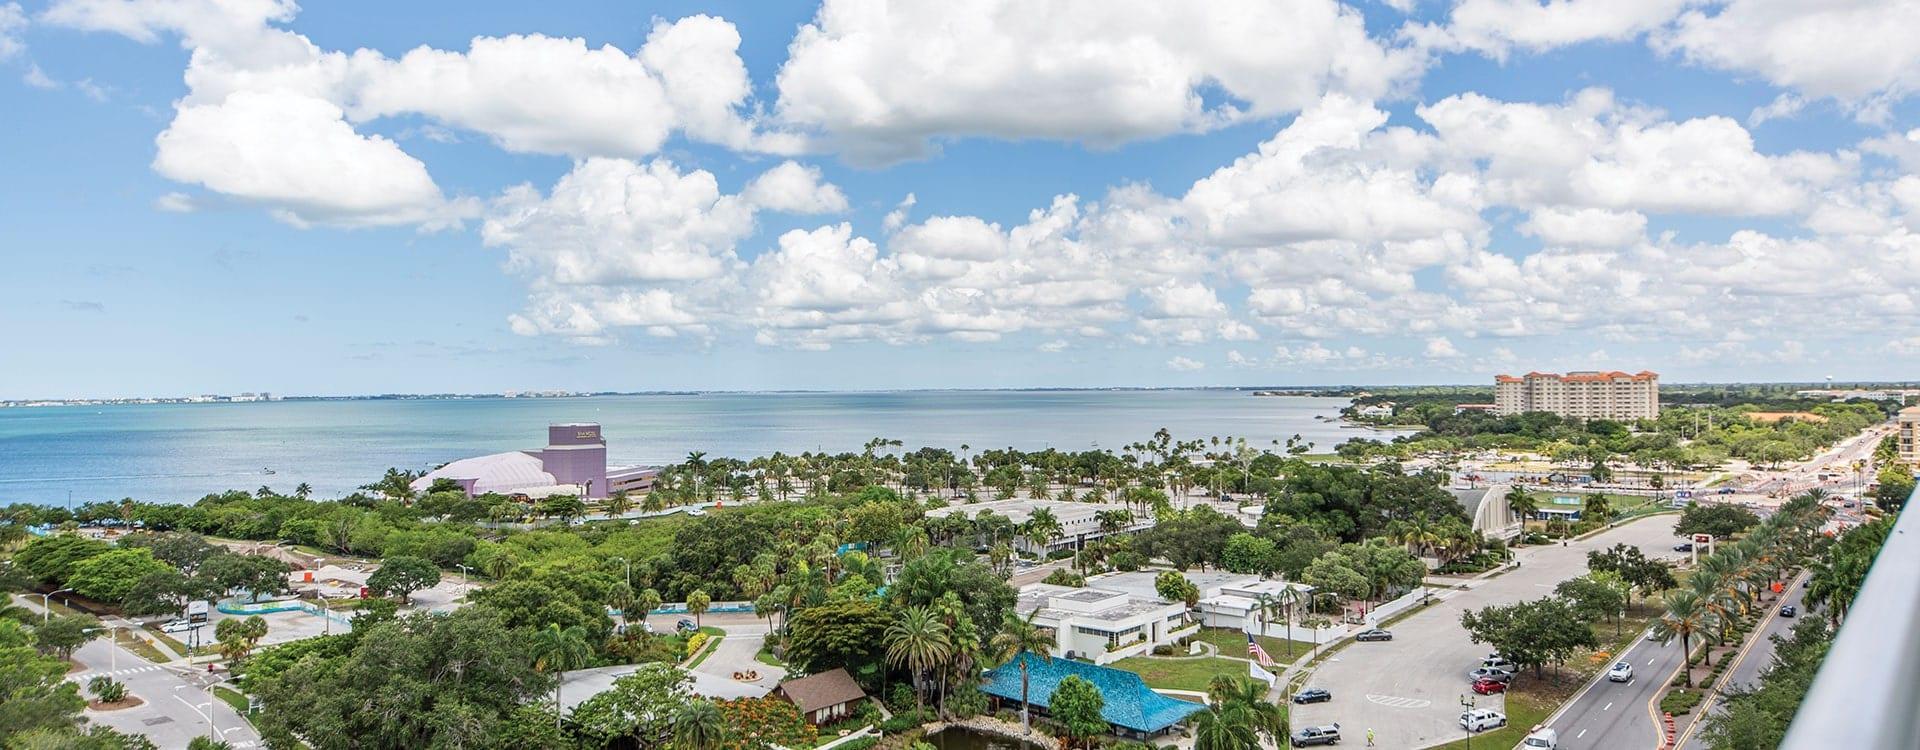 BLVD Sarasota Residence 1102 Terrace view of sarasota and the bayfront